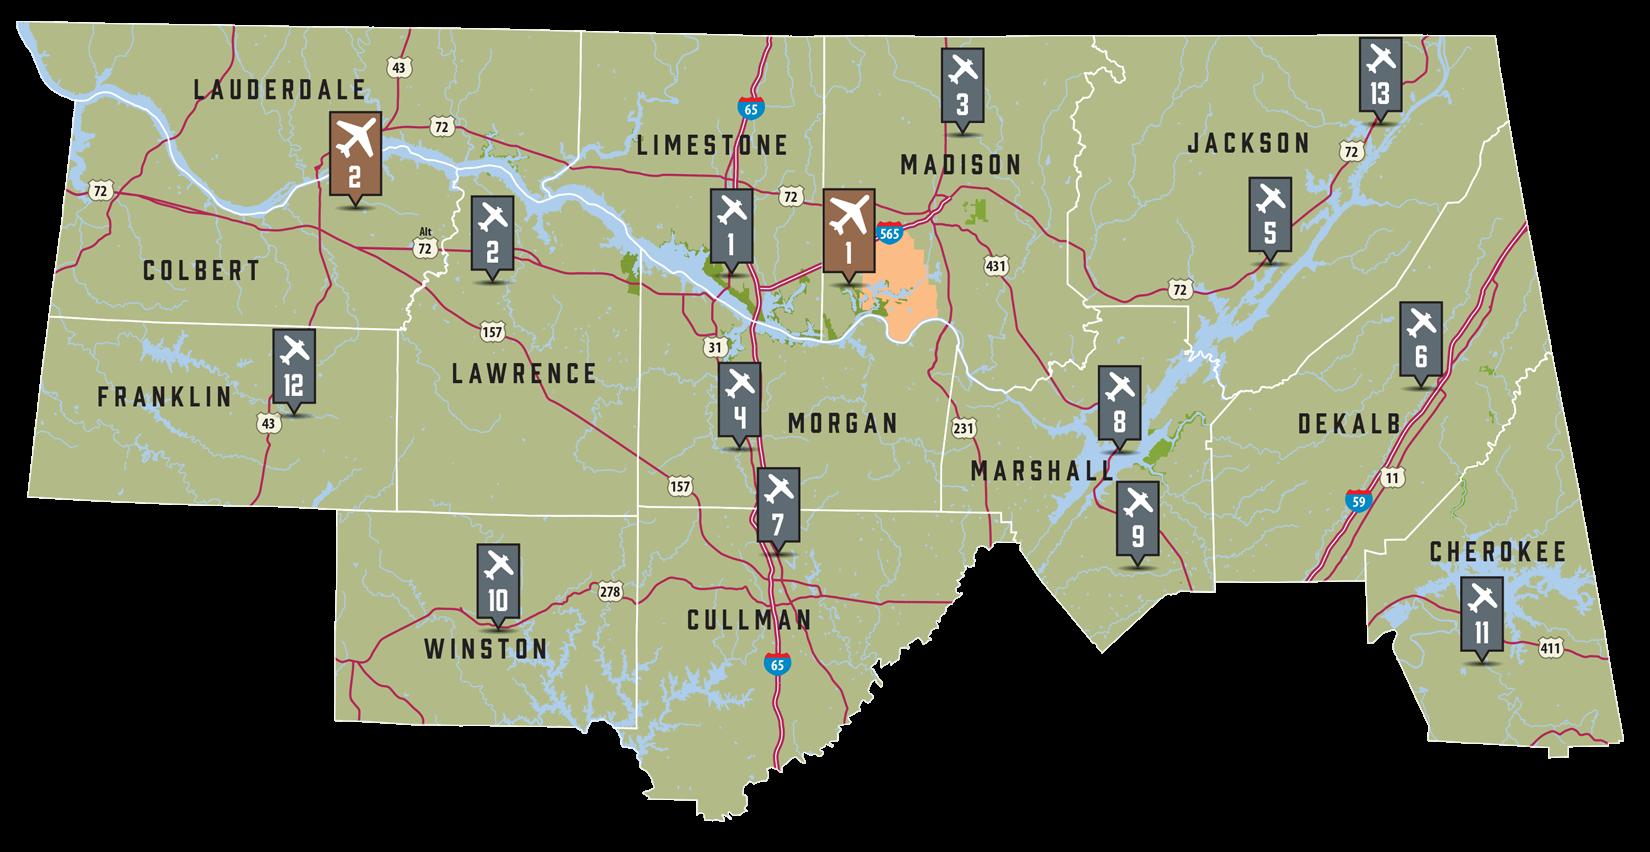 Regional - Southeastern Airport Map